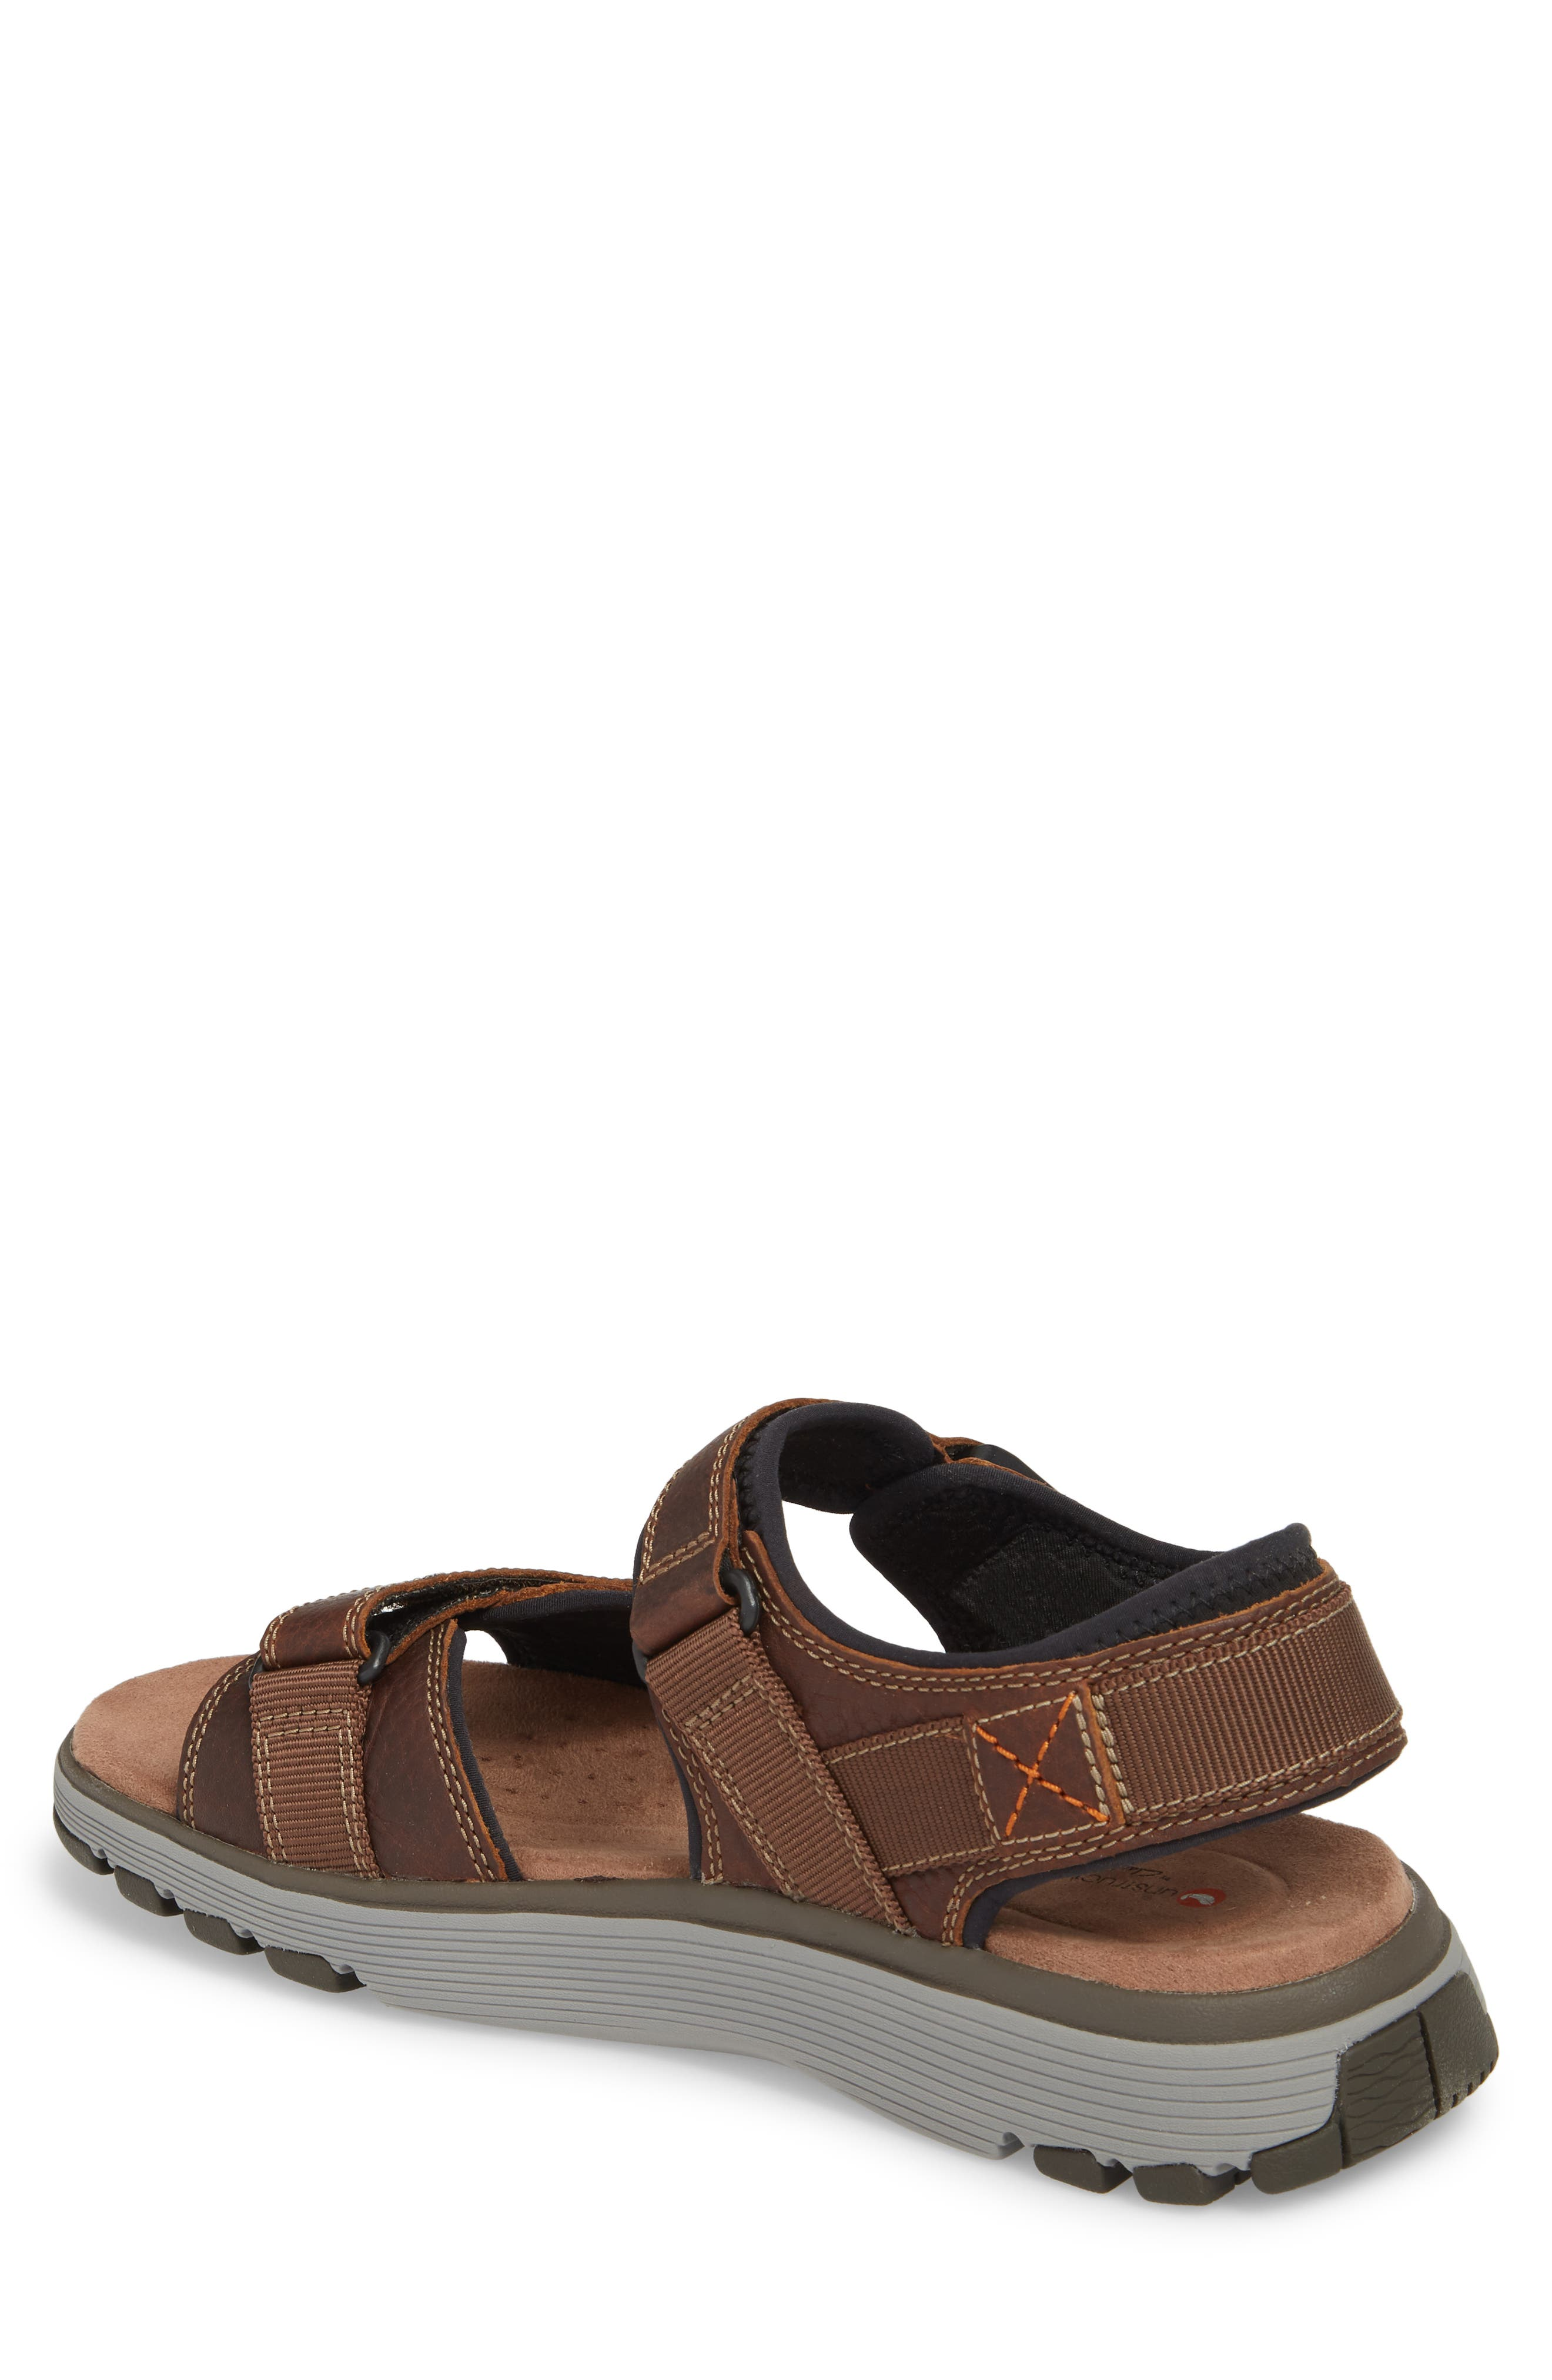 Un Trek Part Sport Sandal,                             Alternate thumbnail 2, color,                             Dark Tan Leather